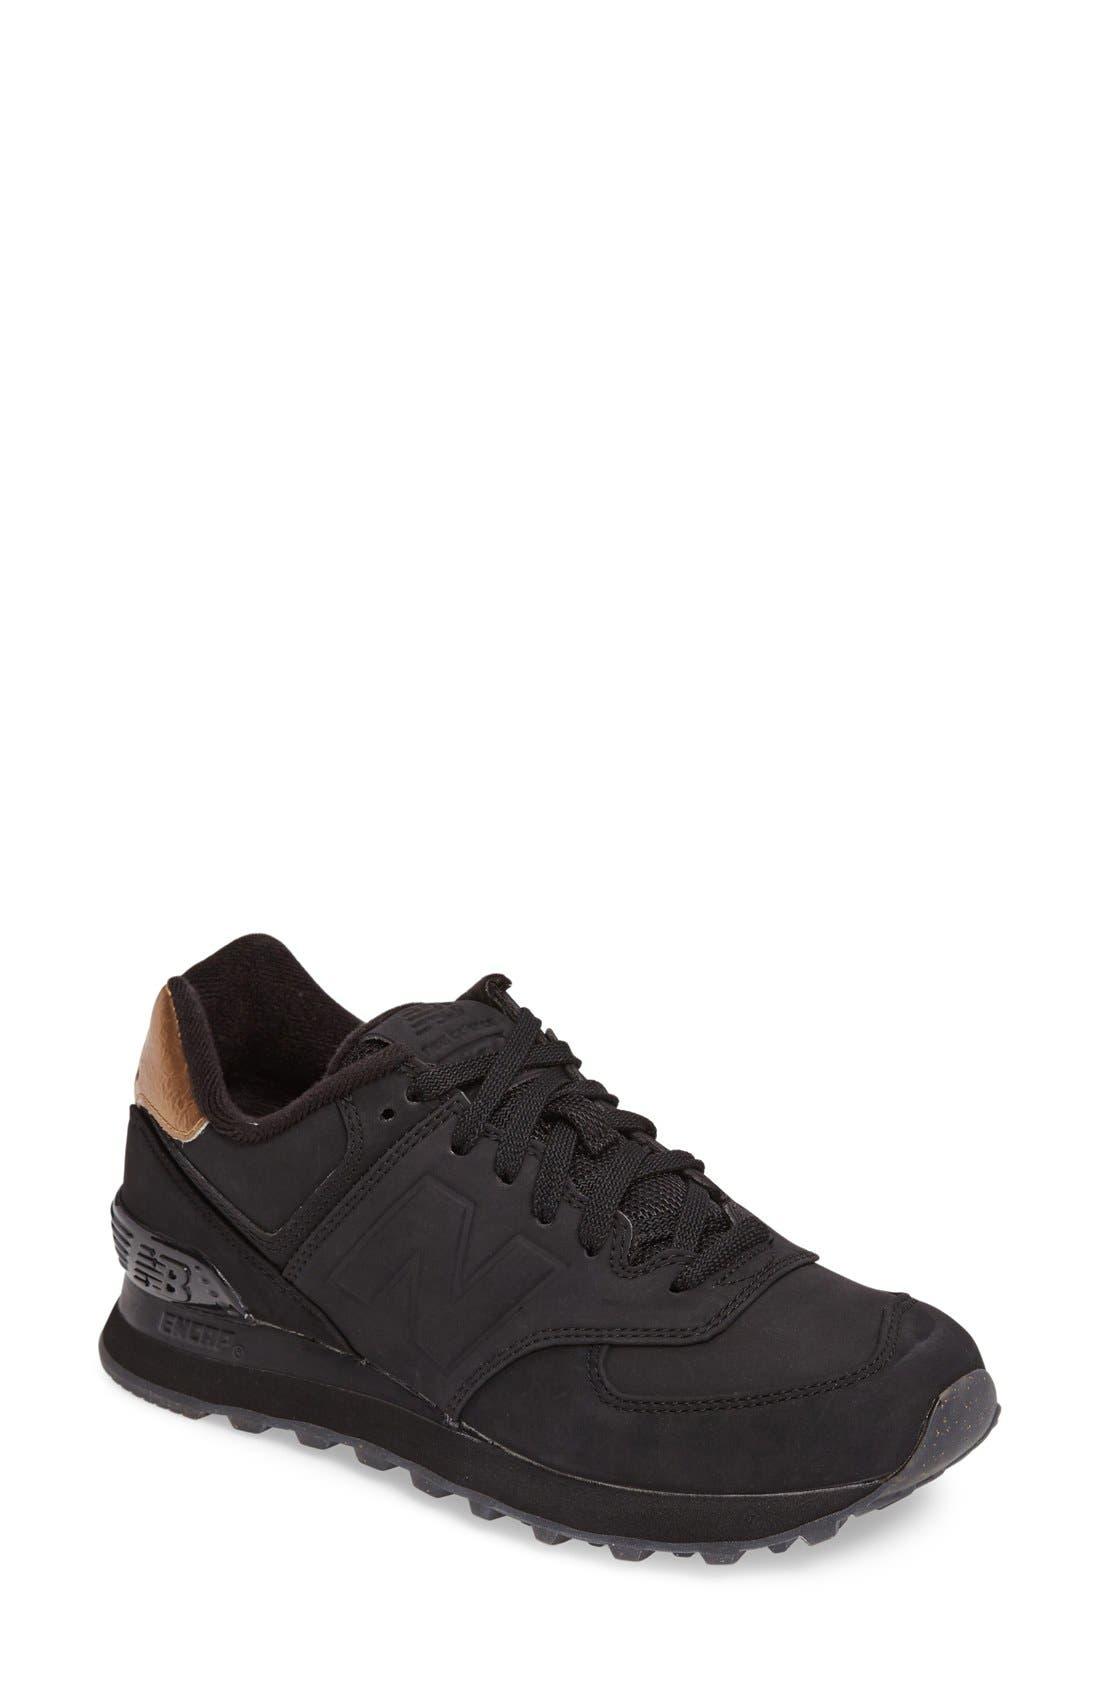 Q416 Retro 574 Sneaker,                             Main thumbnail 1, color,                             009